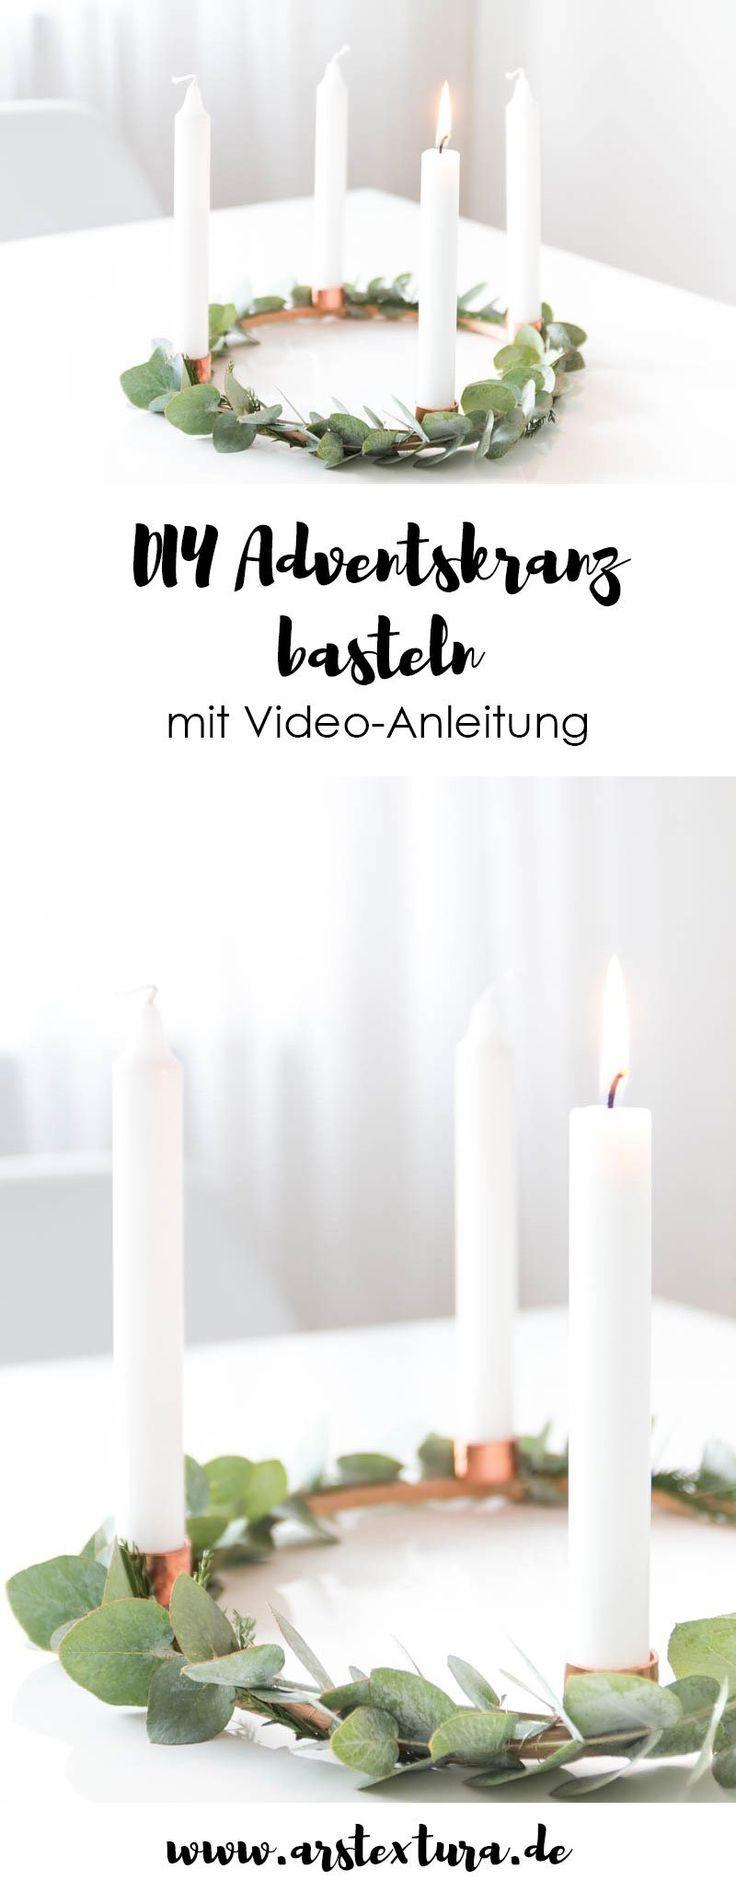 Adventskranz und Adventskalender basteln | ars textura - DIY-Blog #adventskranzskandinavisch